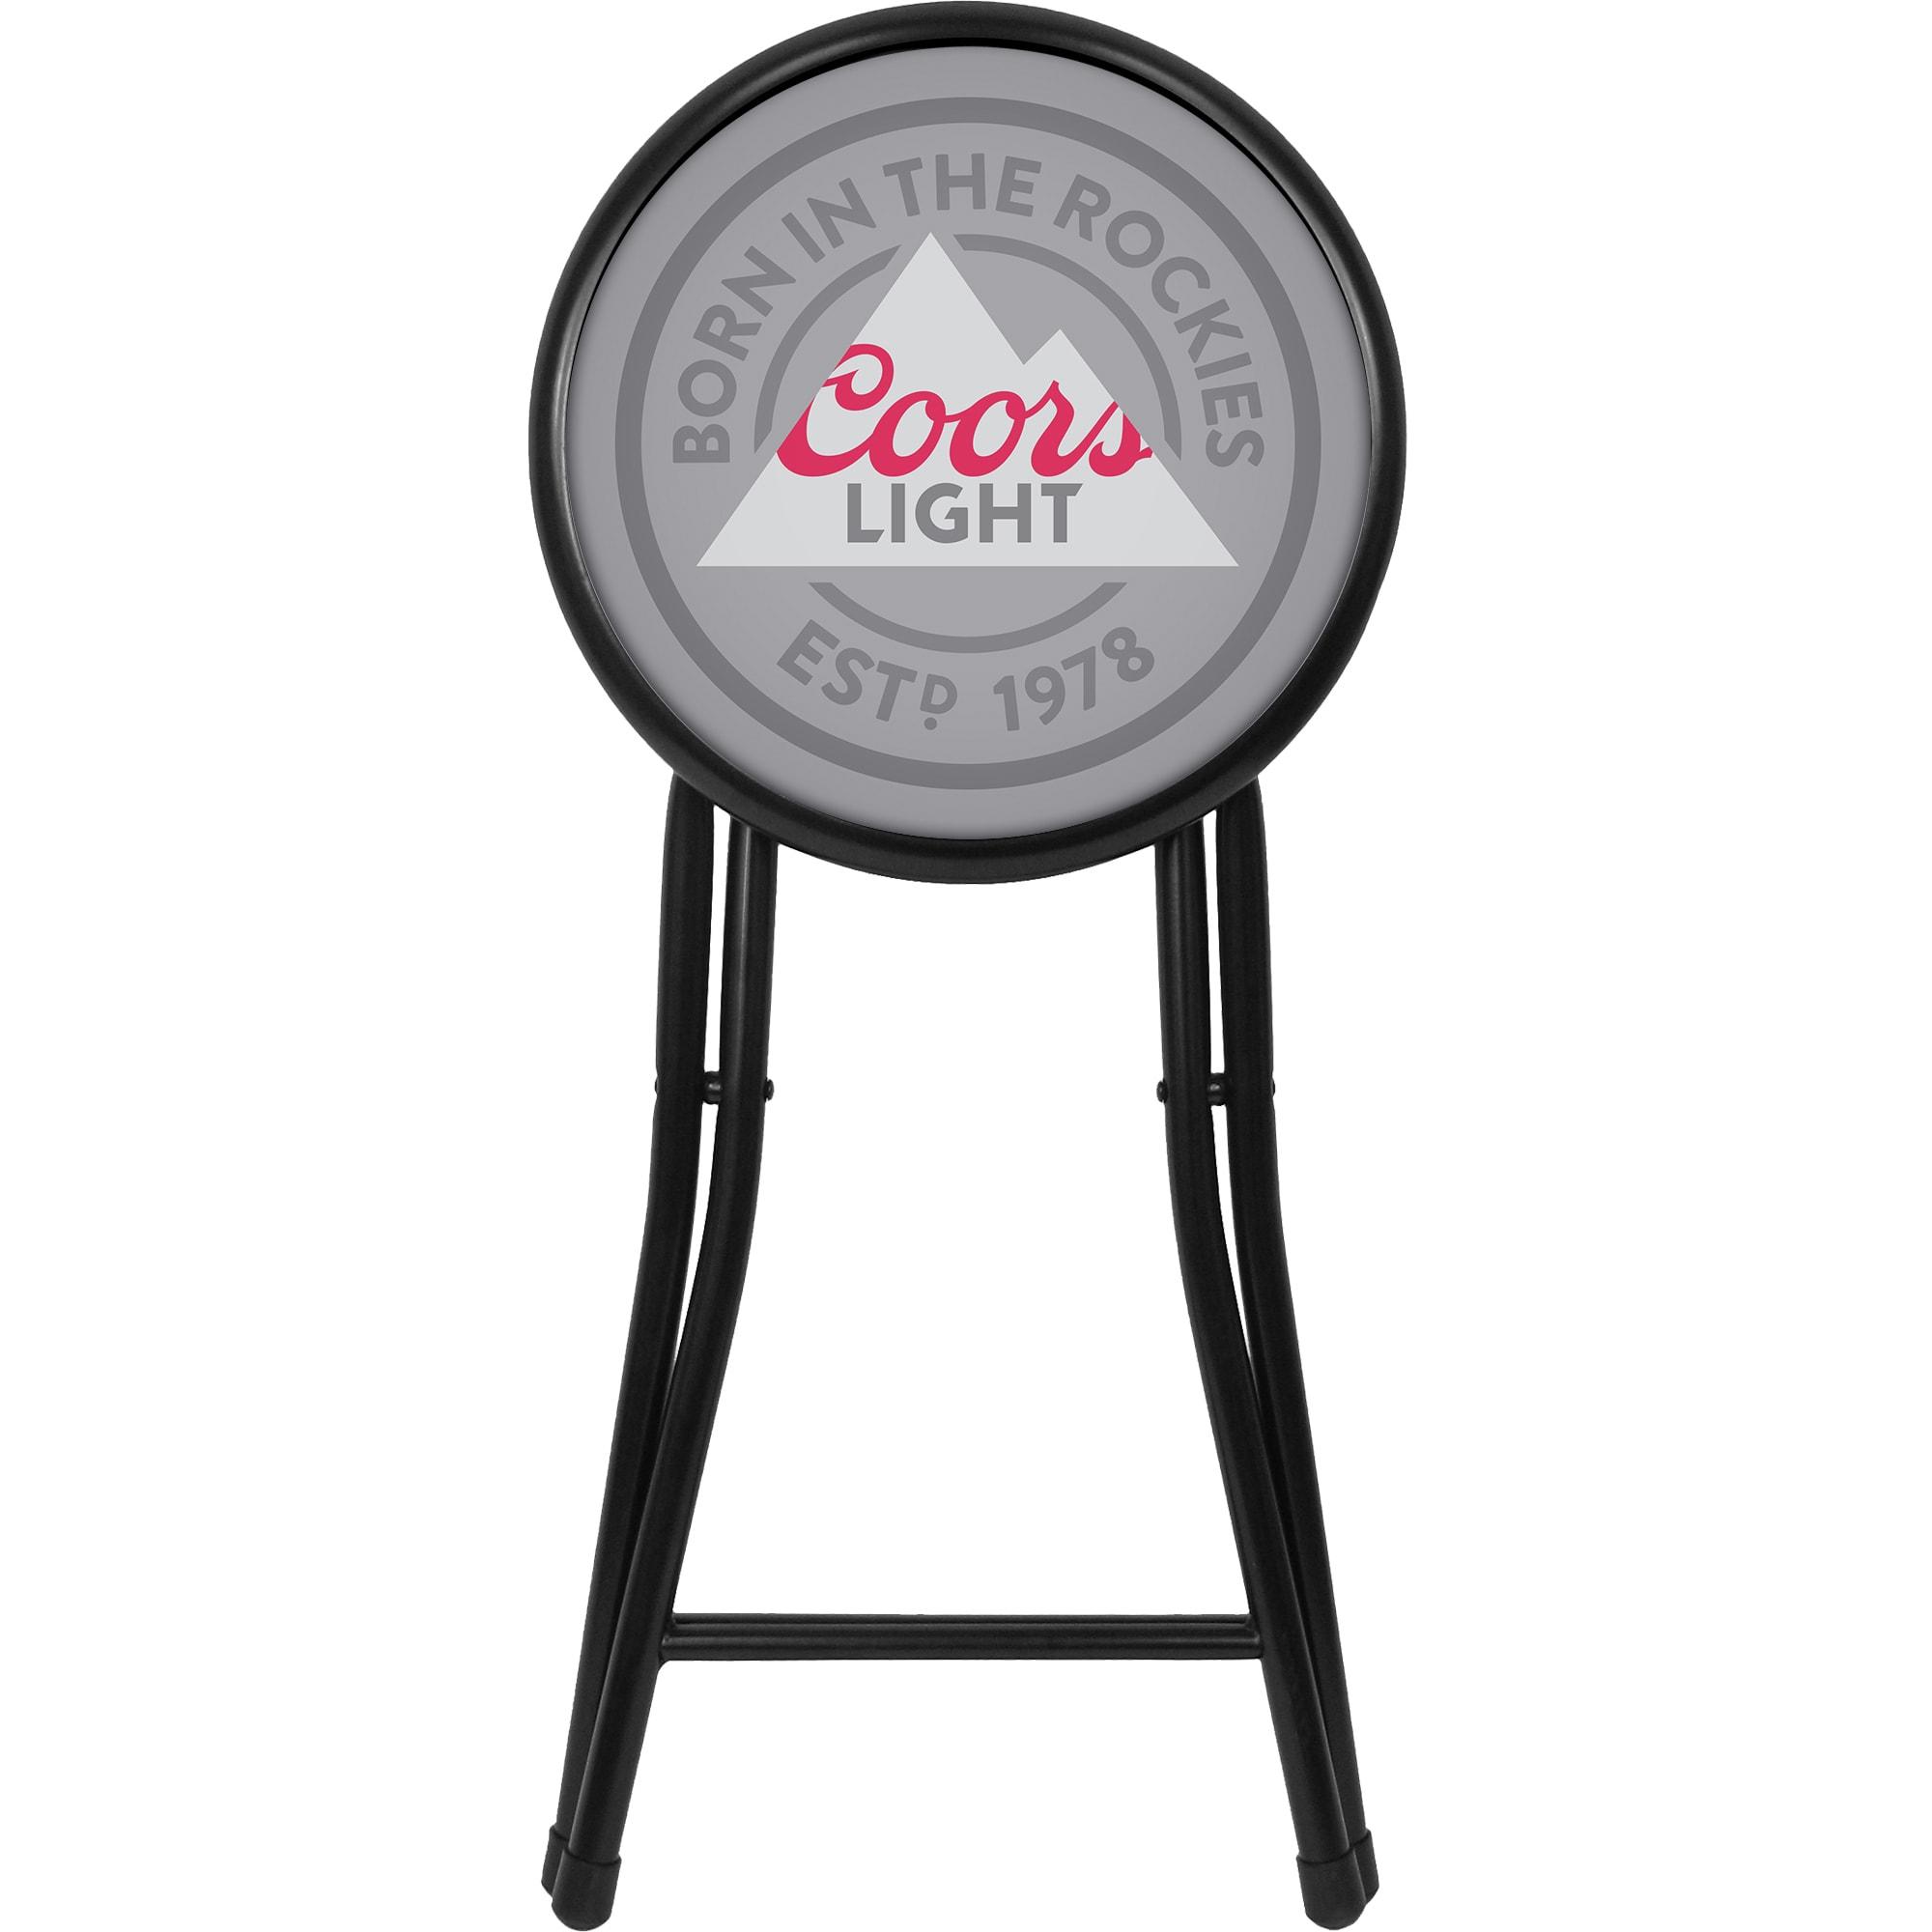 Trademark Coors Light 18-inch Folding Stool (18 Inch Fold...